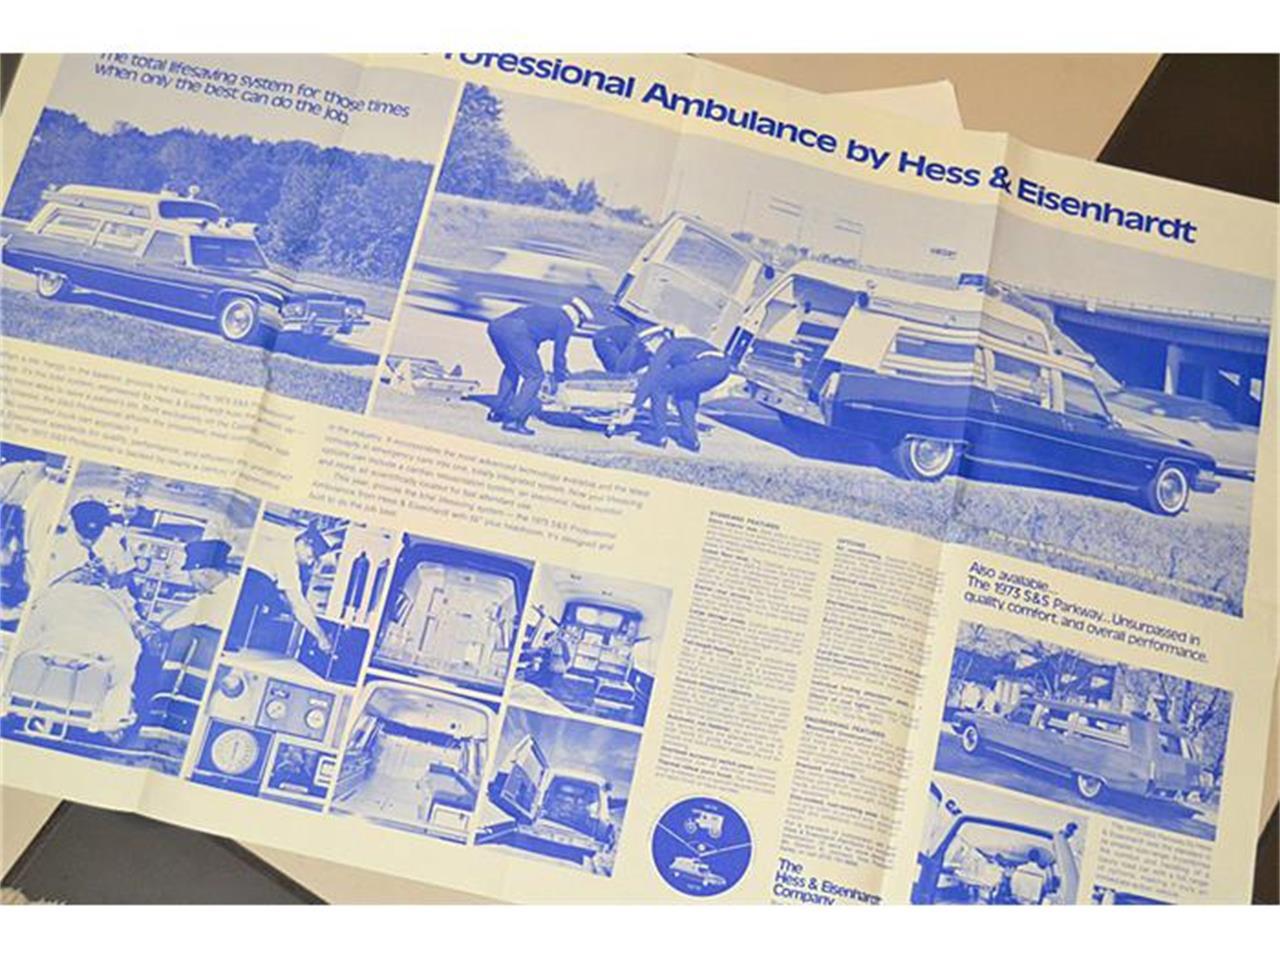 Large Picture of Classic 1972 Cadillac S&S Kesington Professional Ambulance located in Mount Dora (Orlando) Florida - IWNH